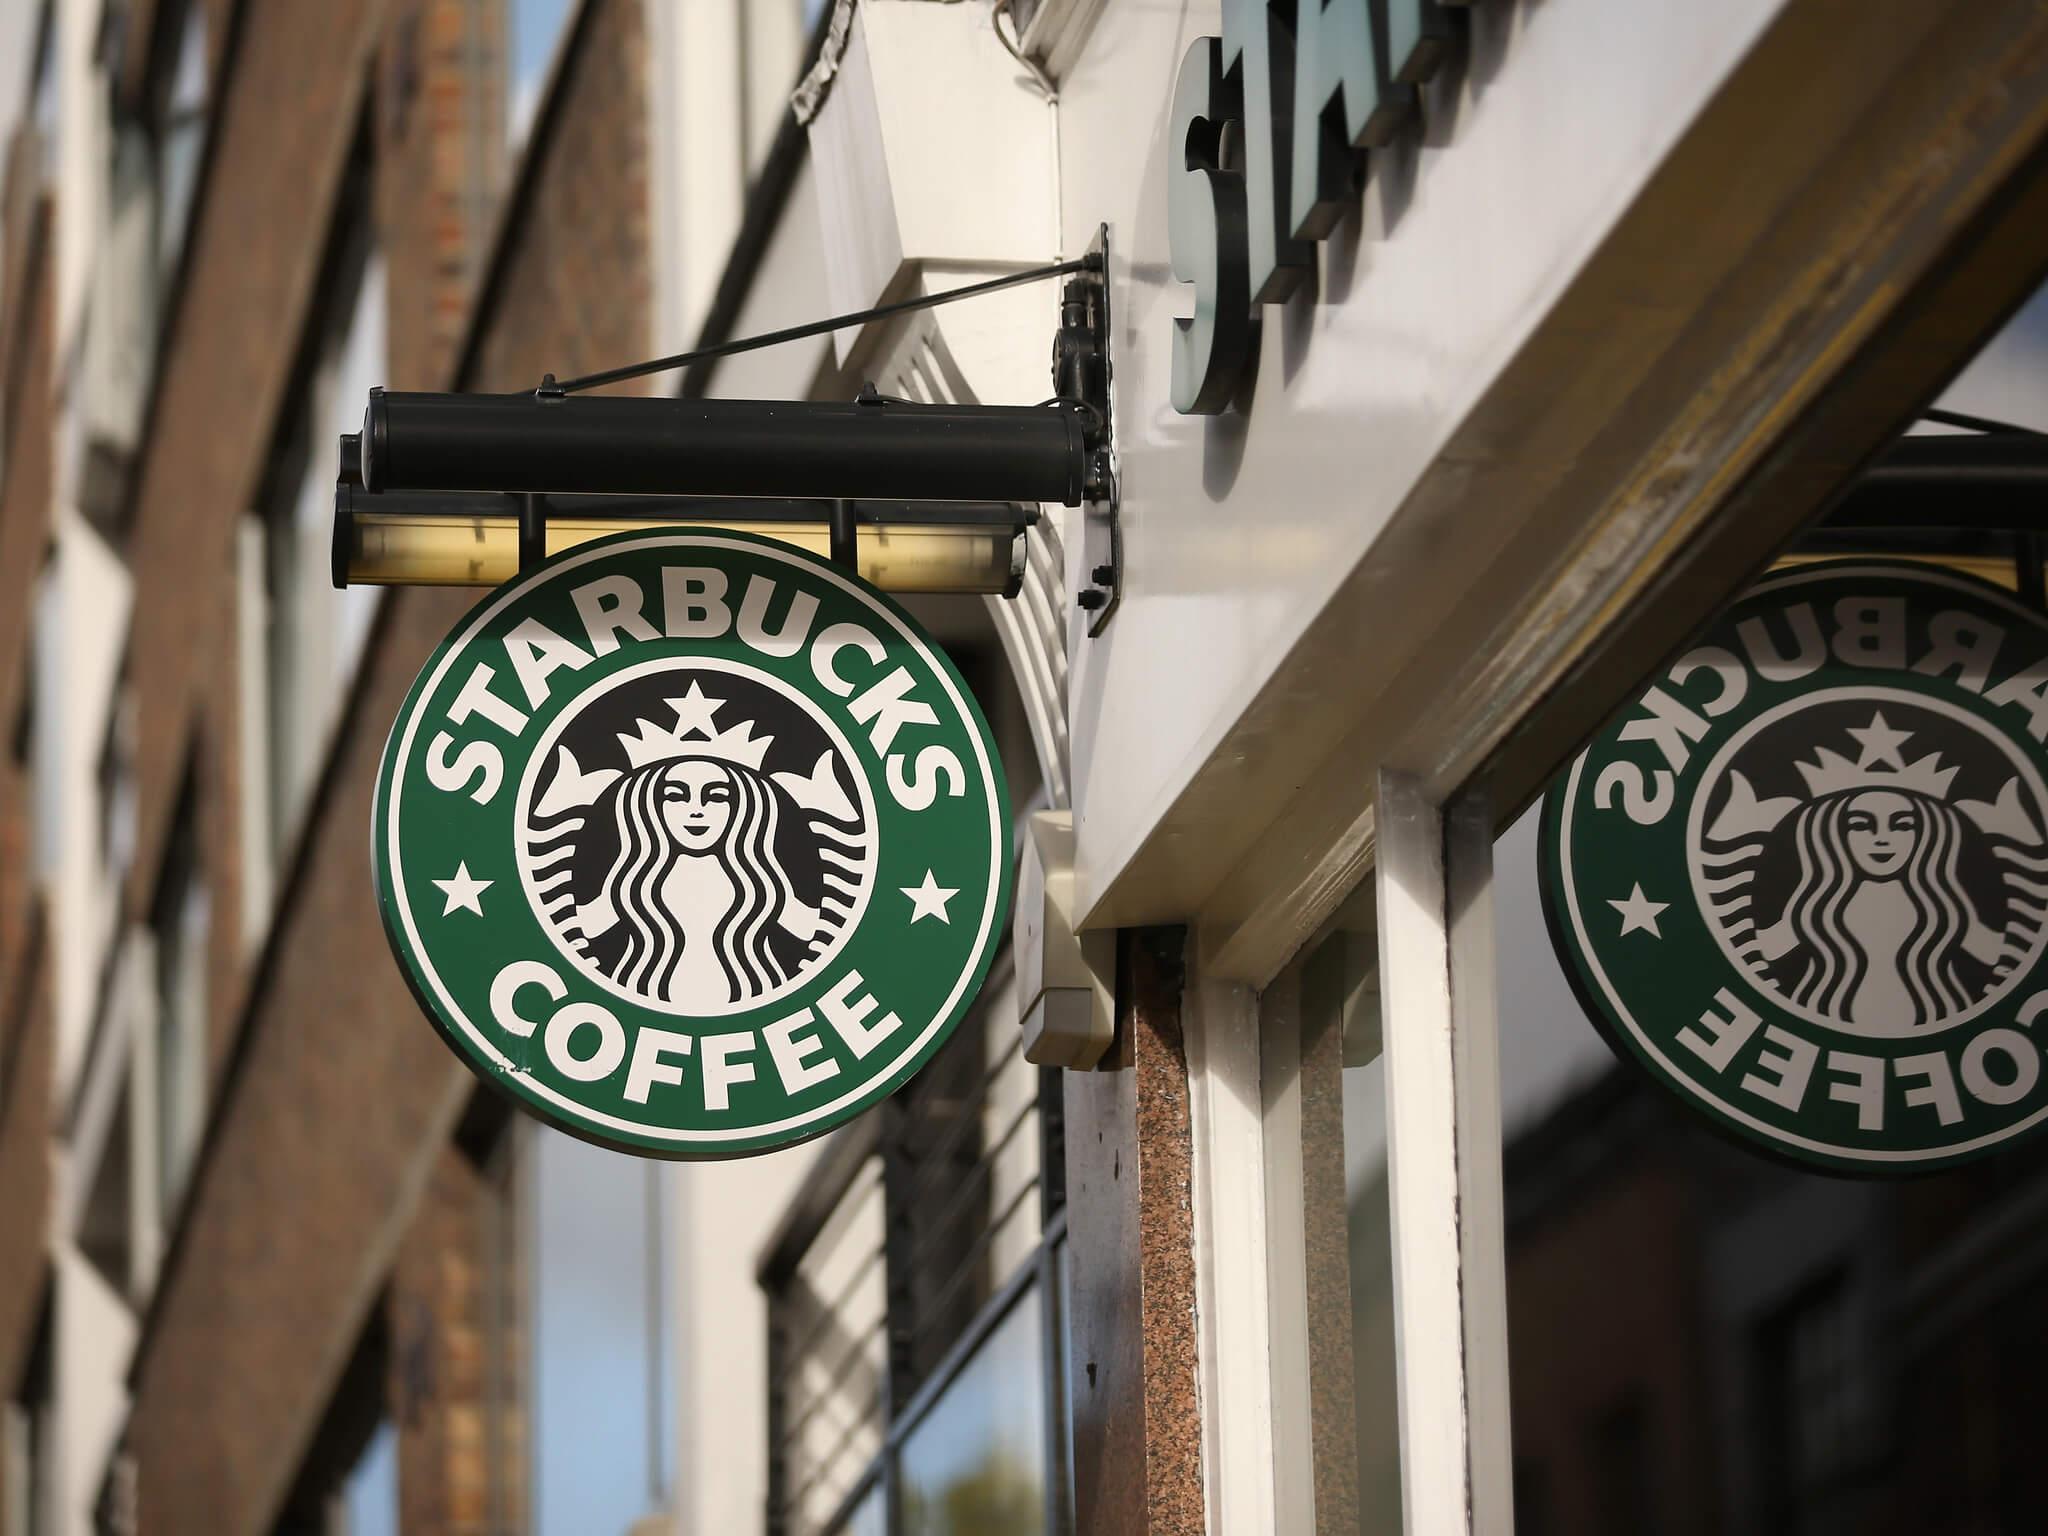 56: The coffee shop problem